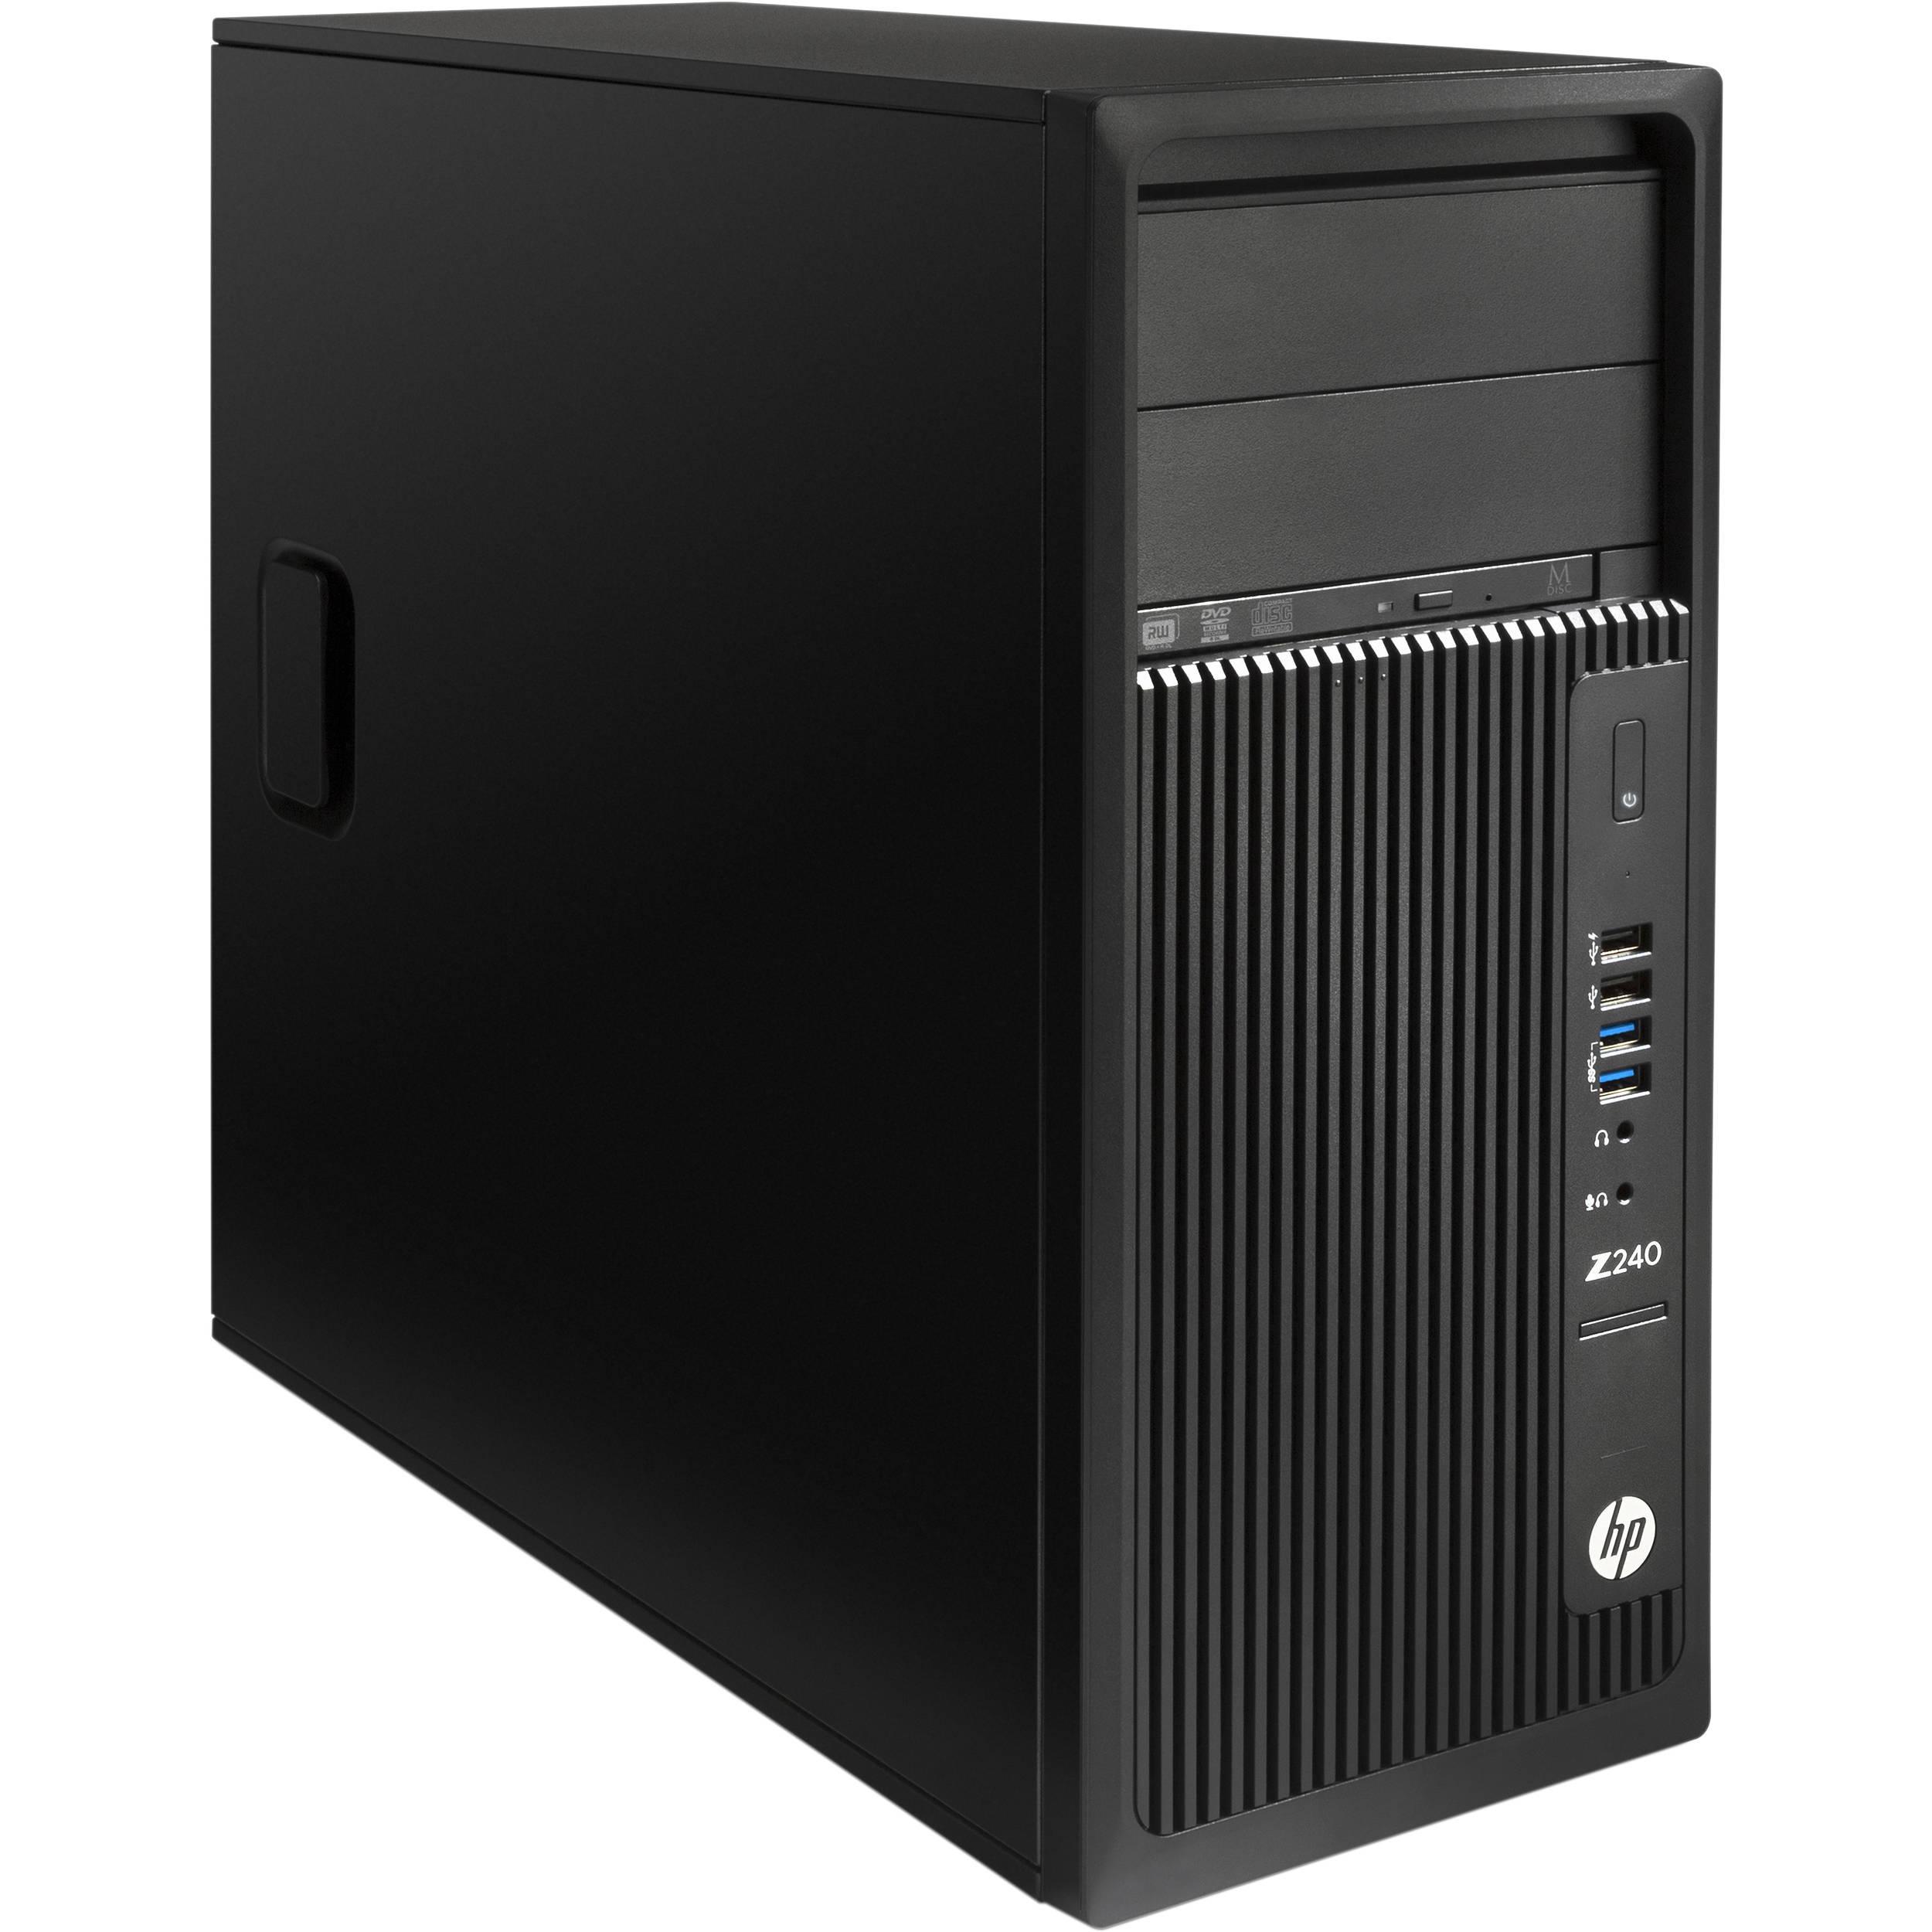 HP Mini 100e Education Edition (ENERGY STAR) Realtek Card Reader Windows 8 Driver Download